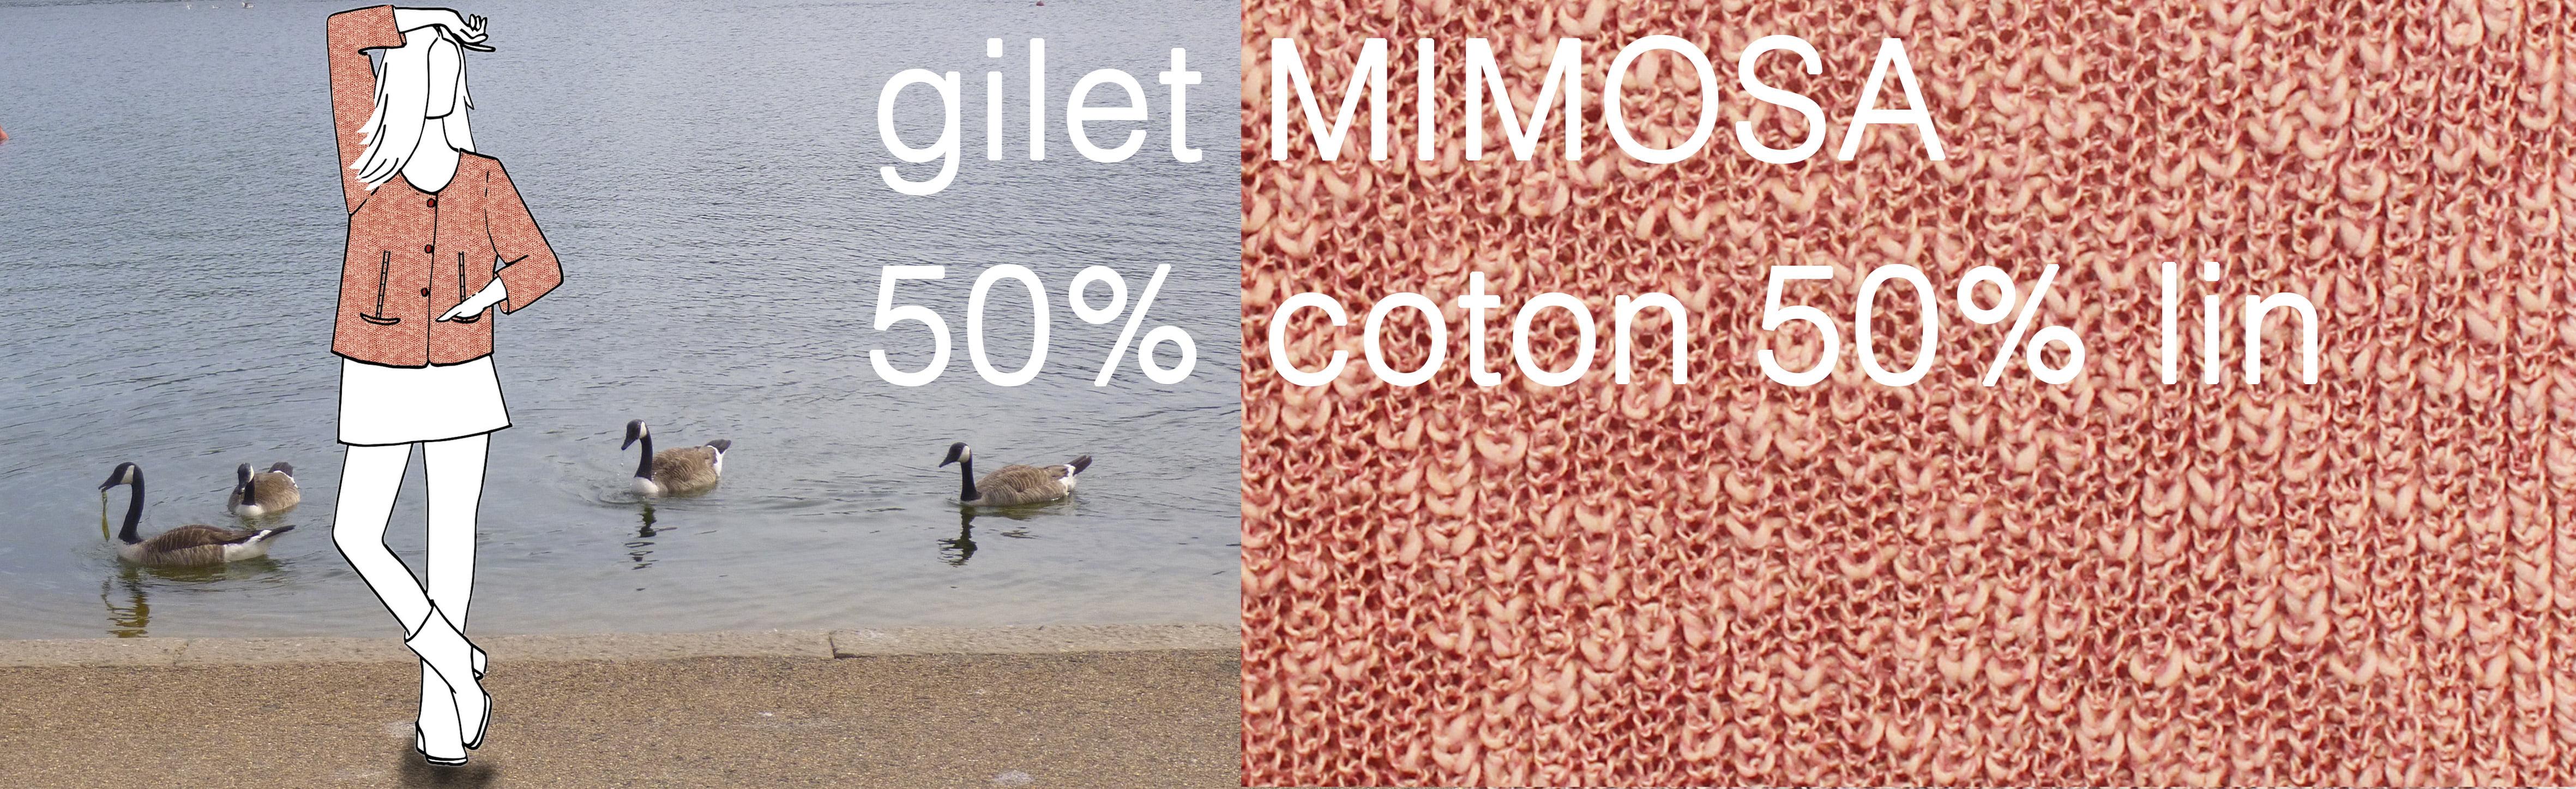 slider gilet mimosa